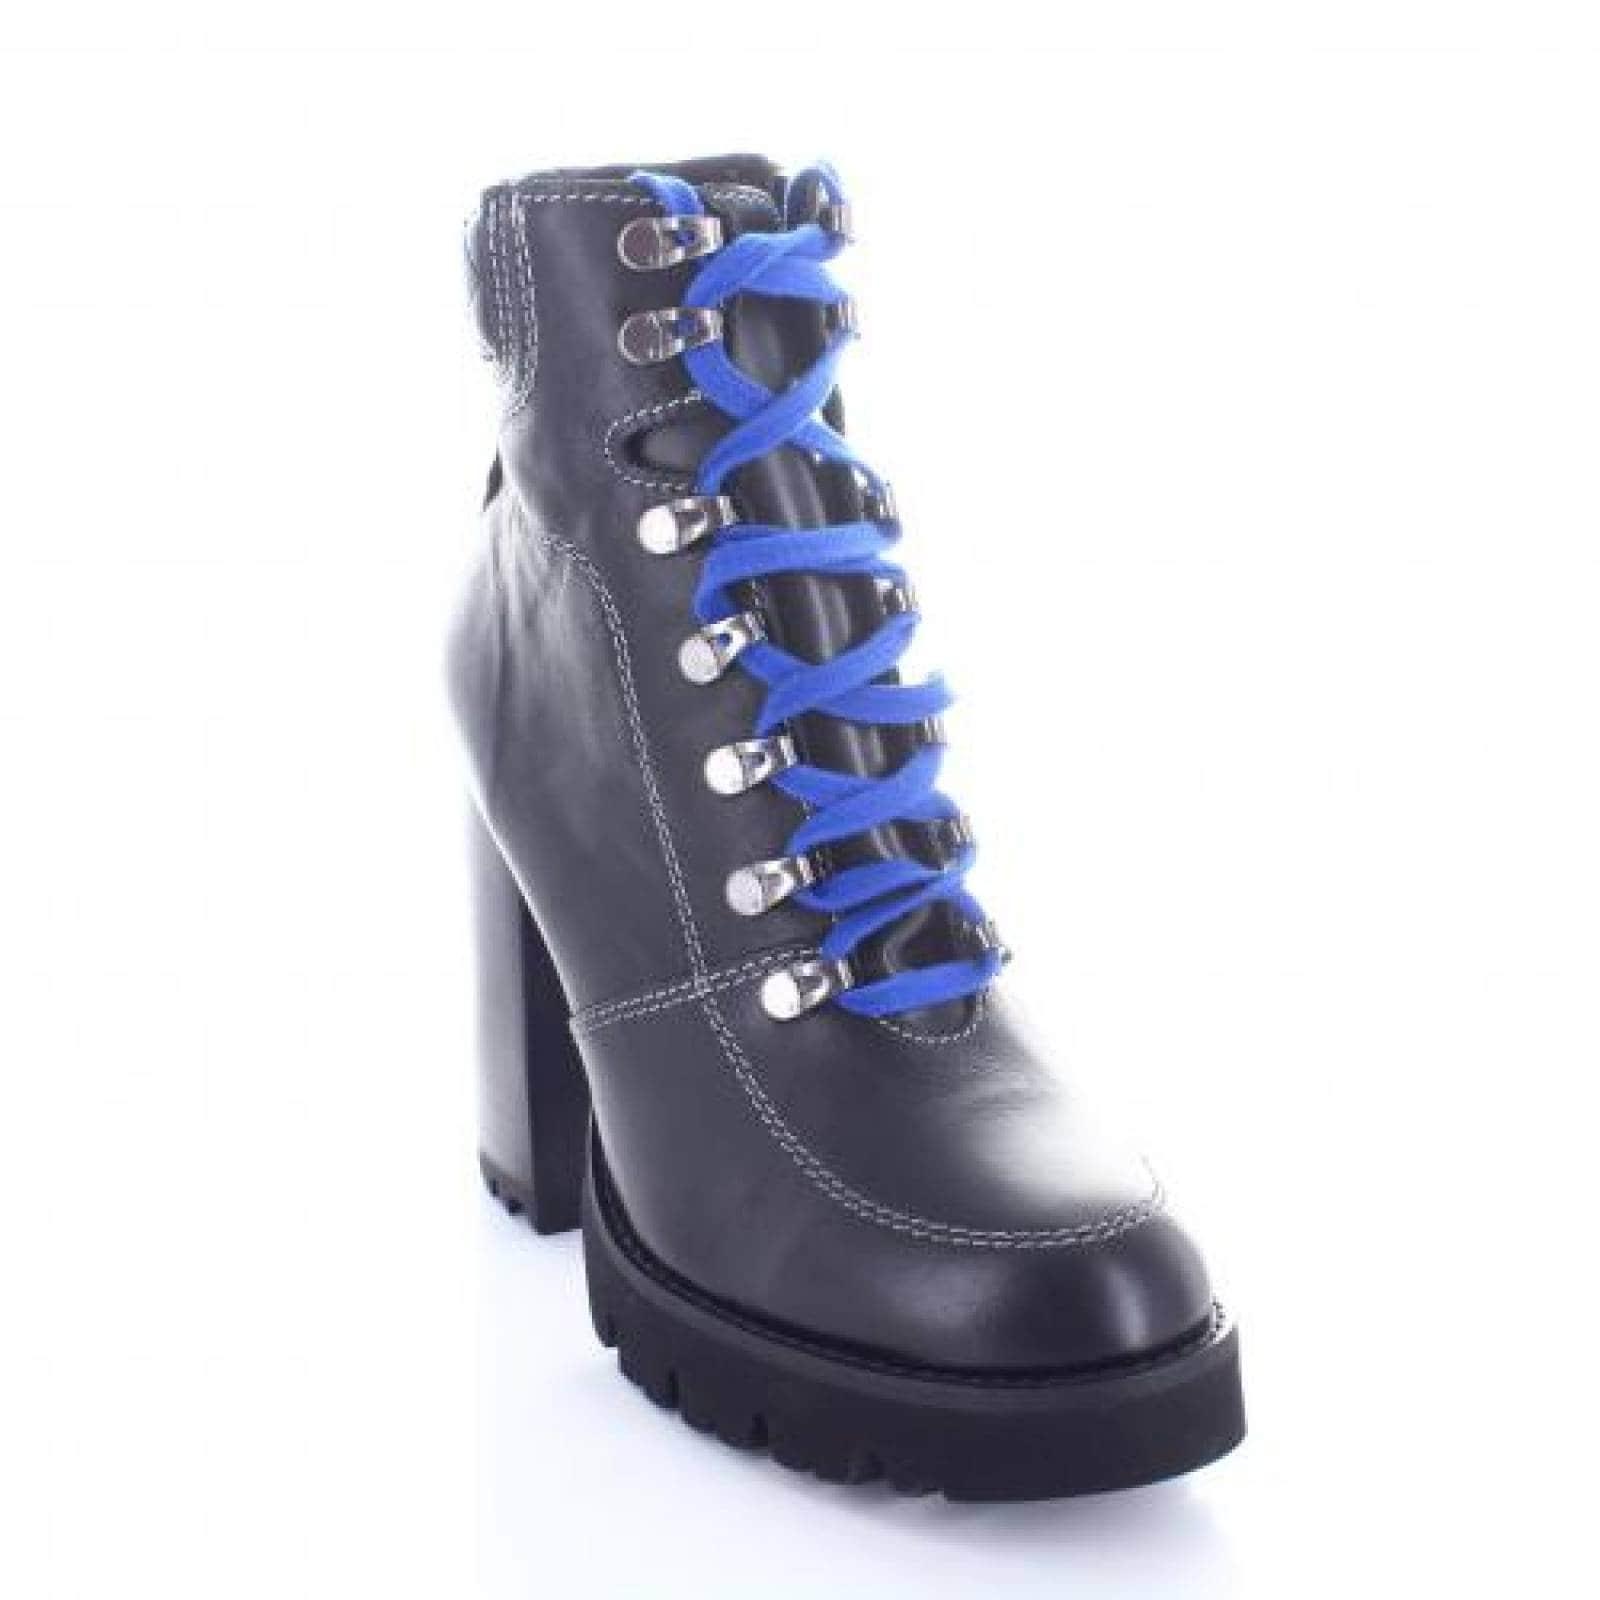 Botin para Mujer Brantano 4604 050375 Color Negro